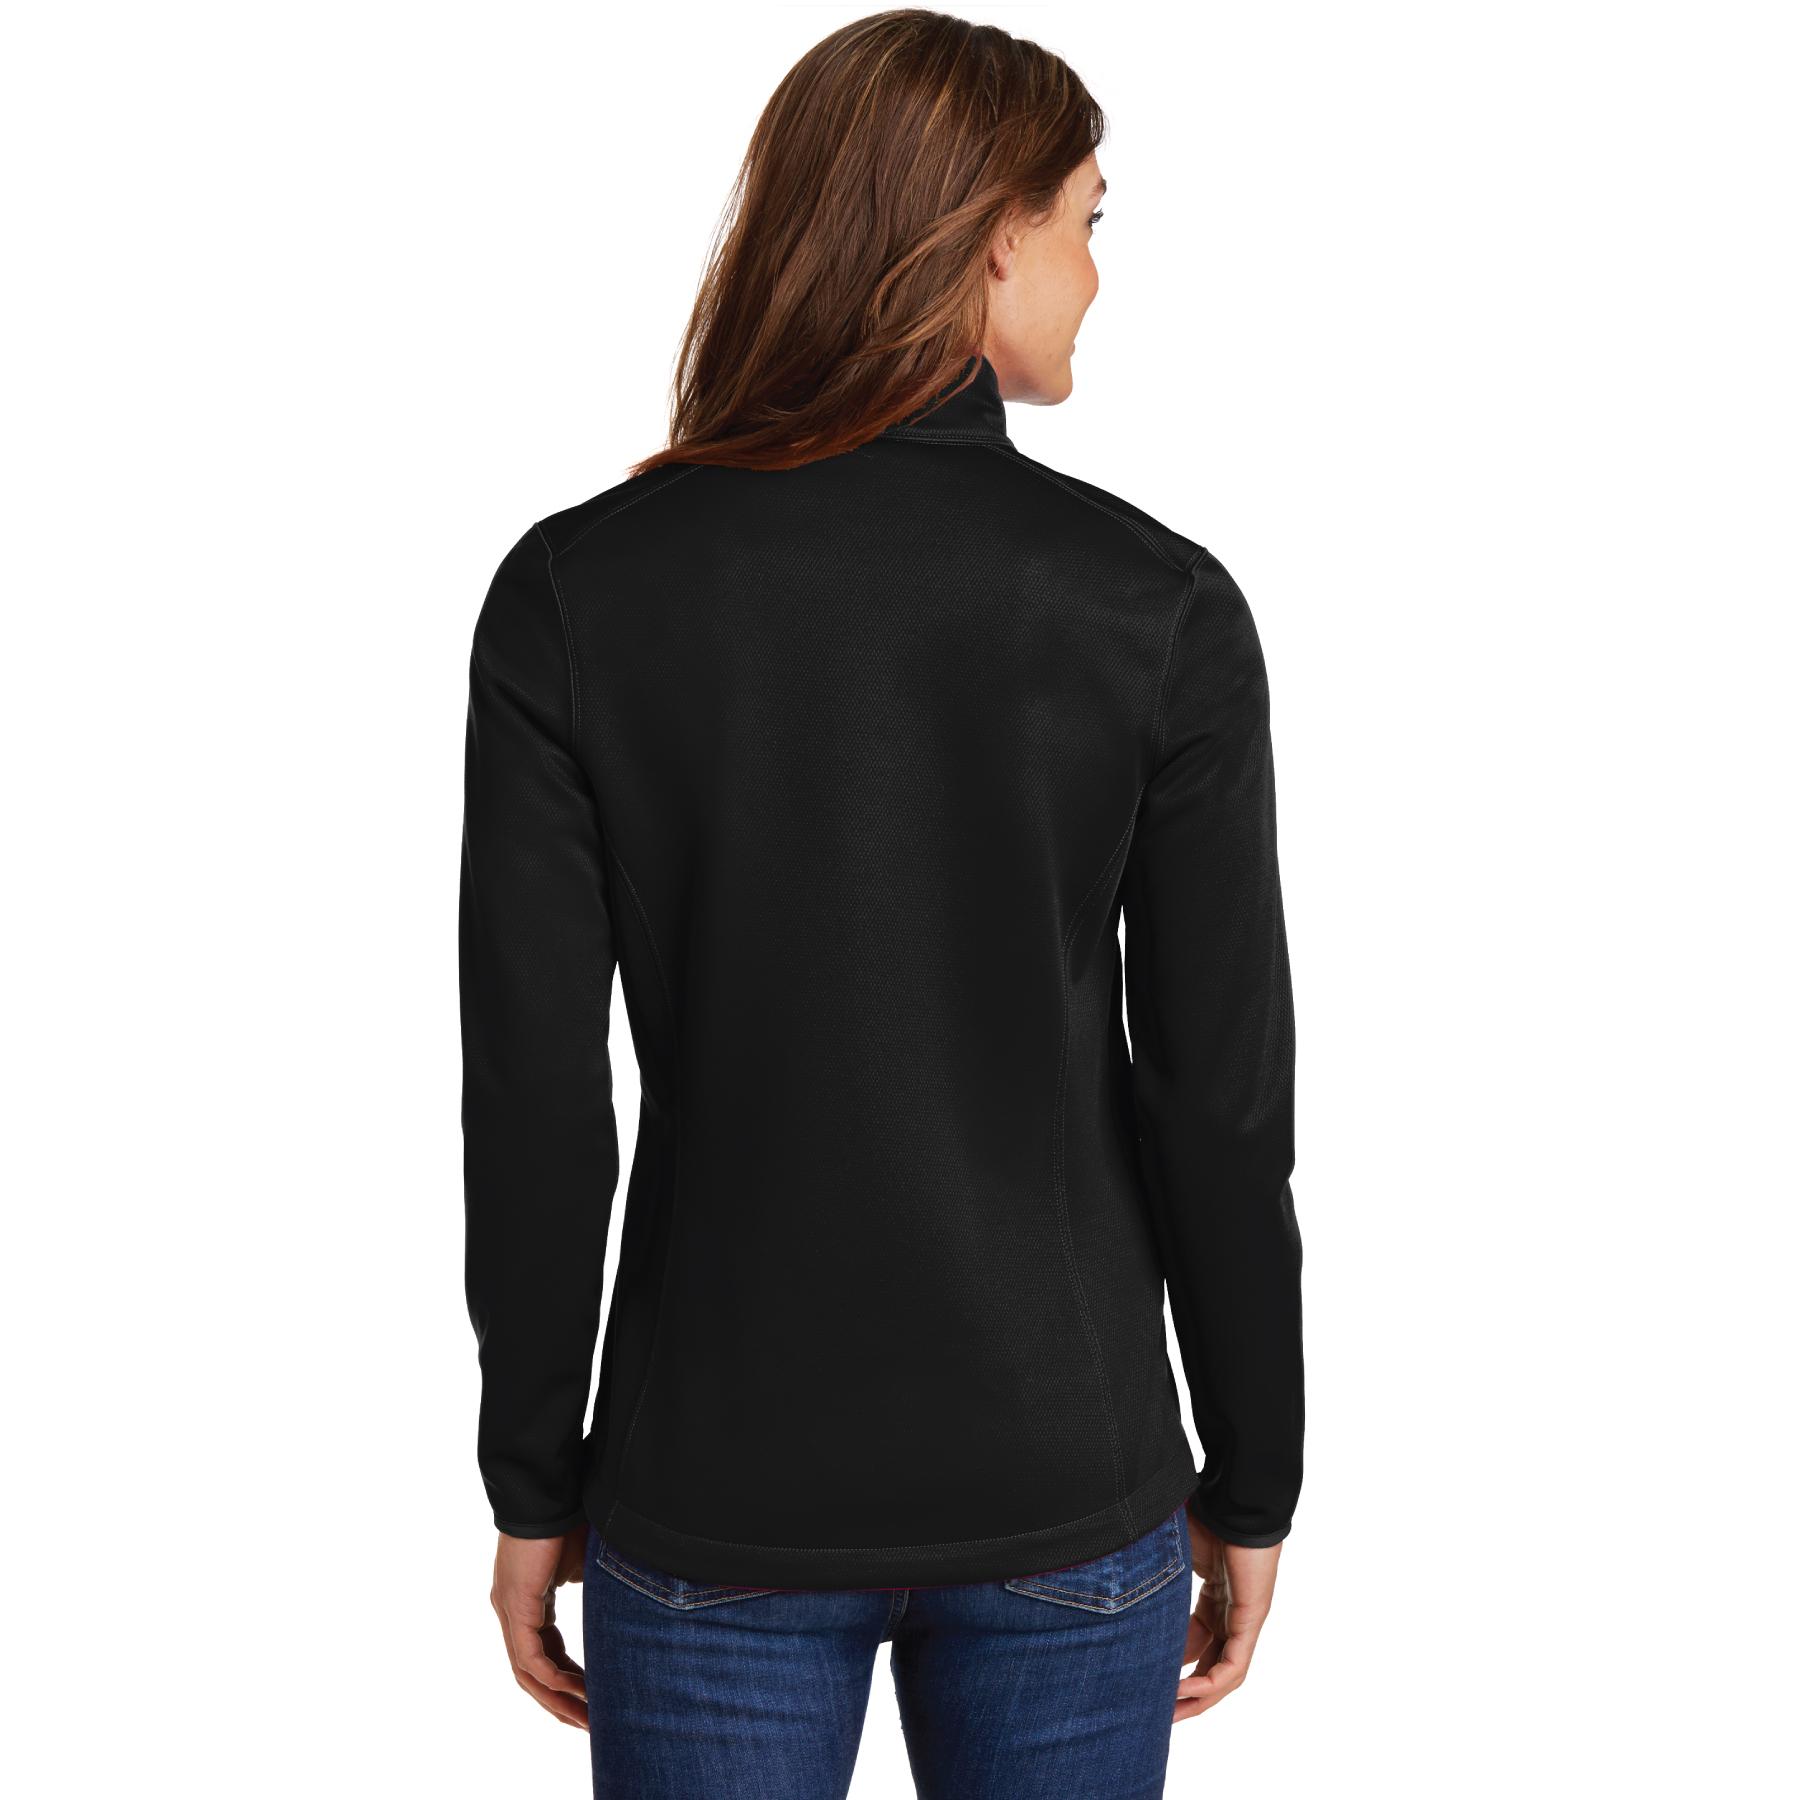 Eddie Bauer® Ladies Weather-Resist Soft Shell Jacket - RCL4083